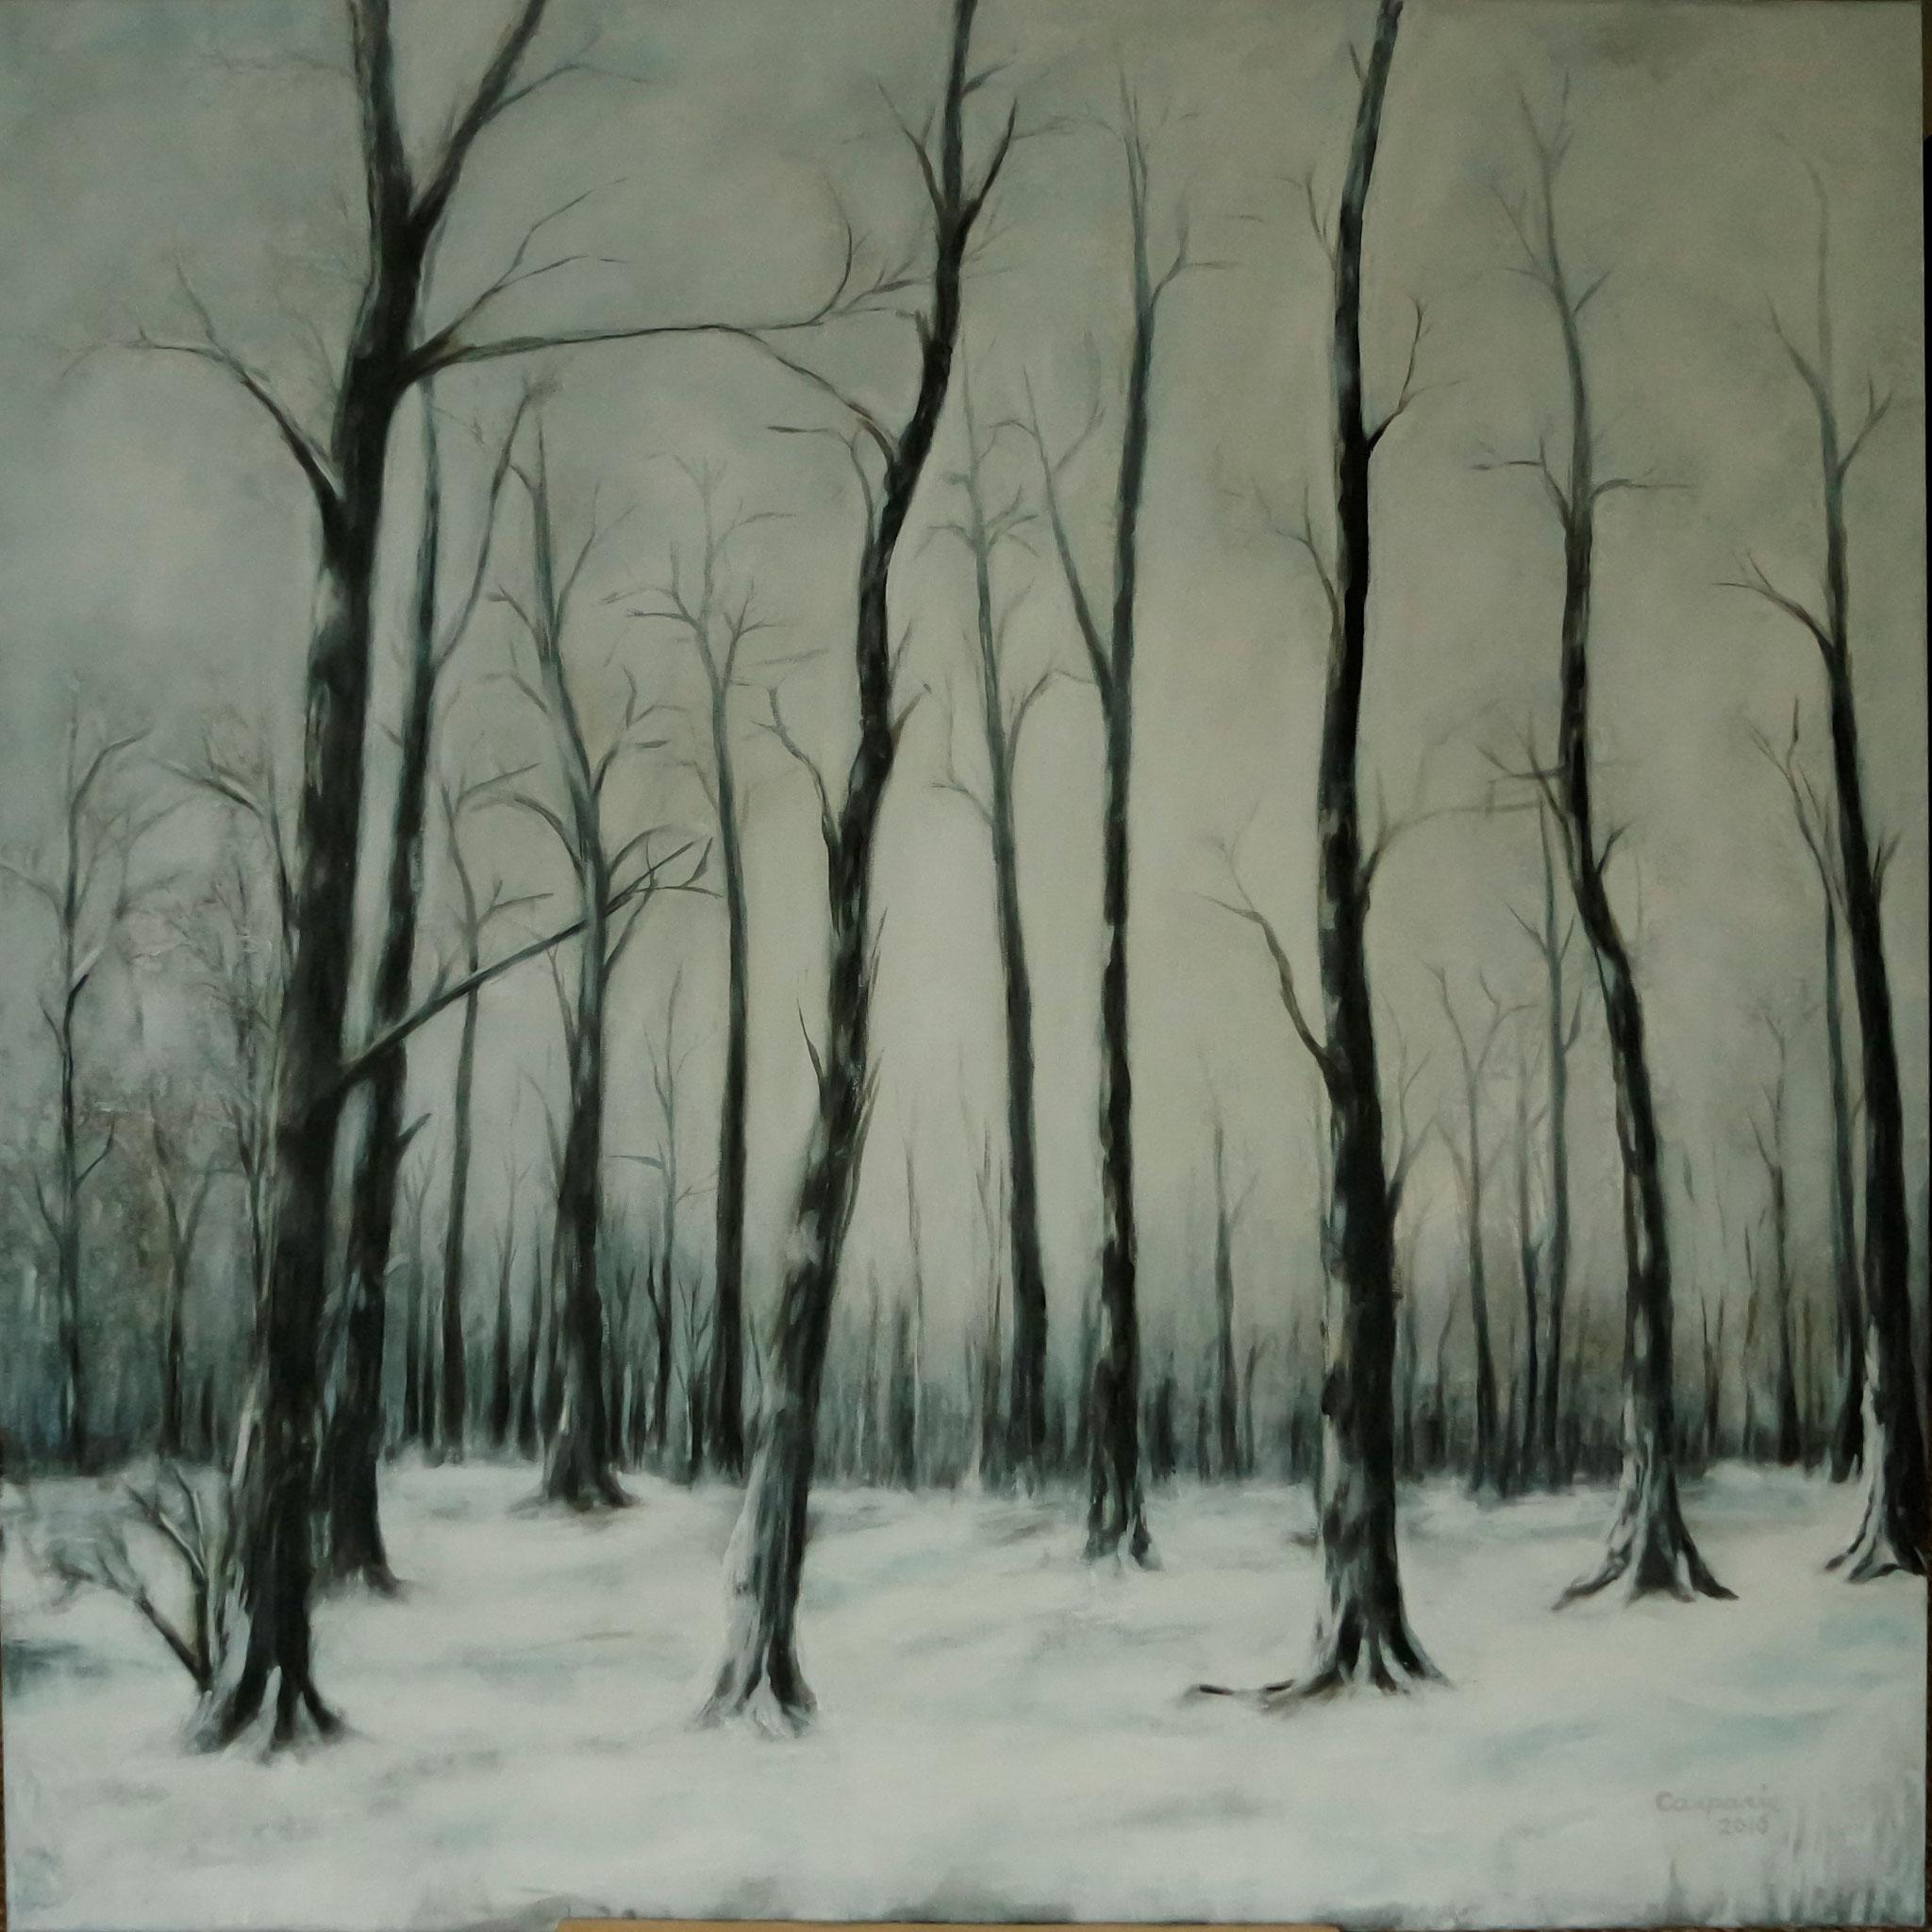 Bevroren bos, Acryl op linnen, 100 x 100 cm.